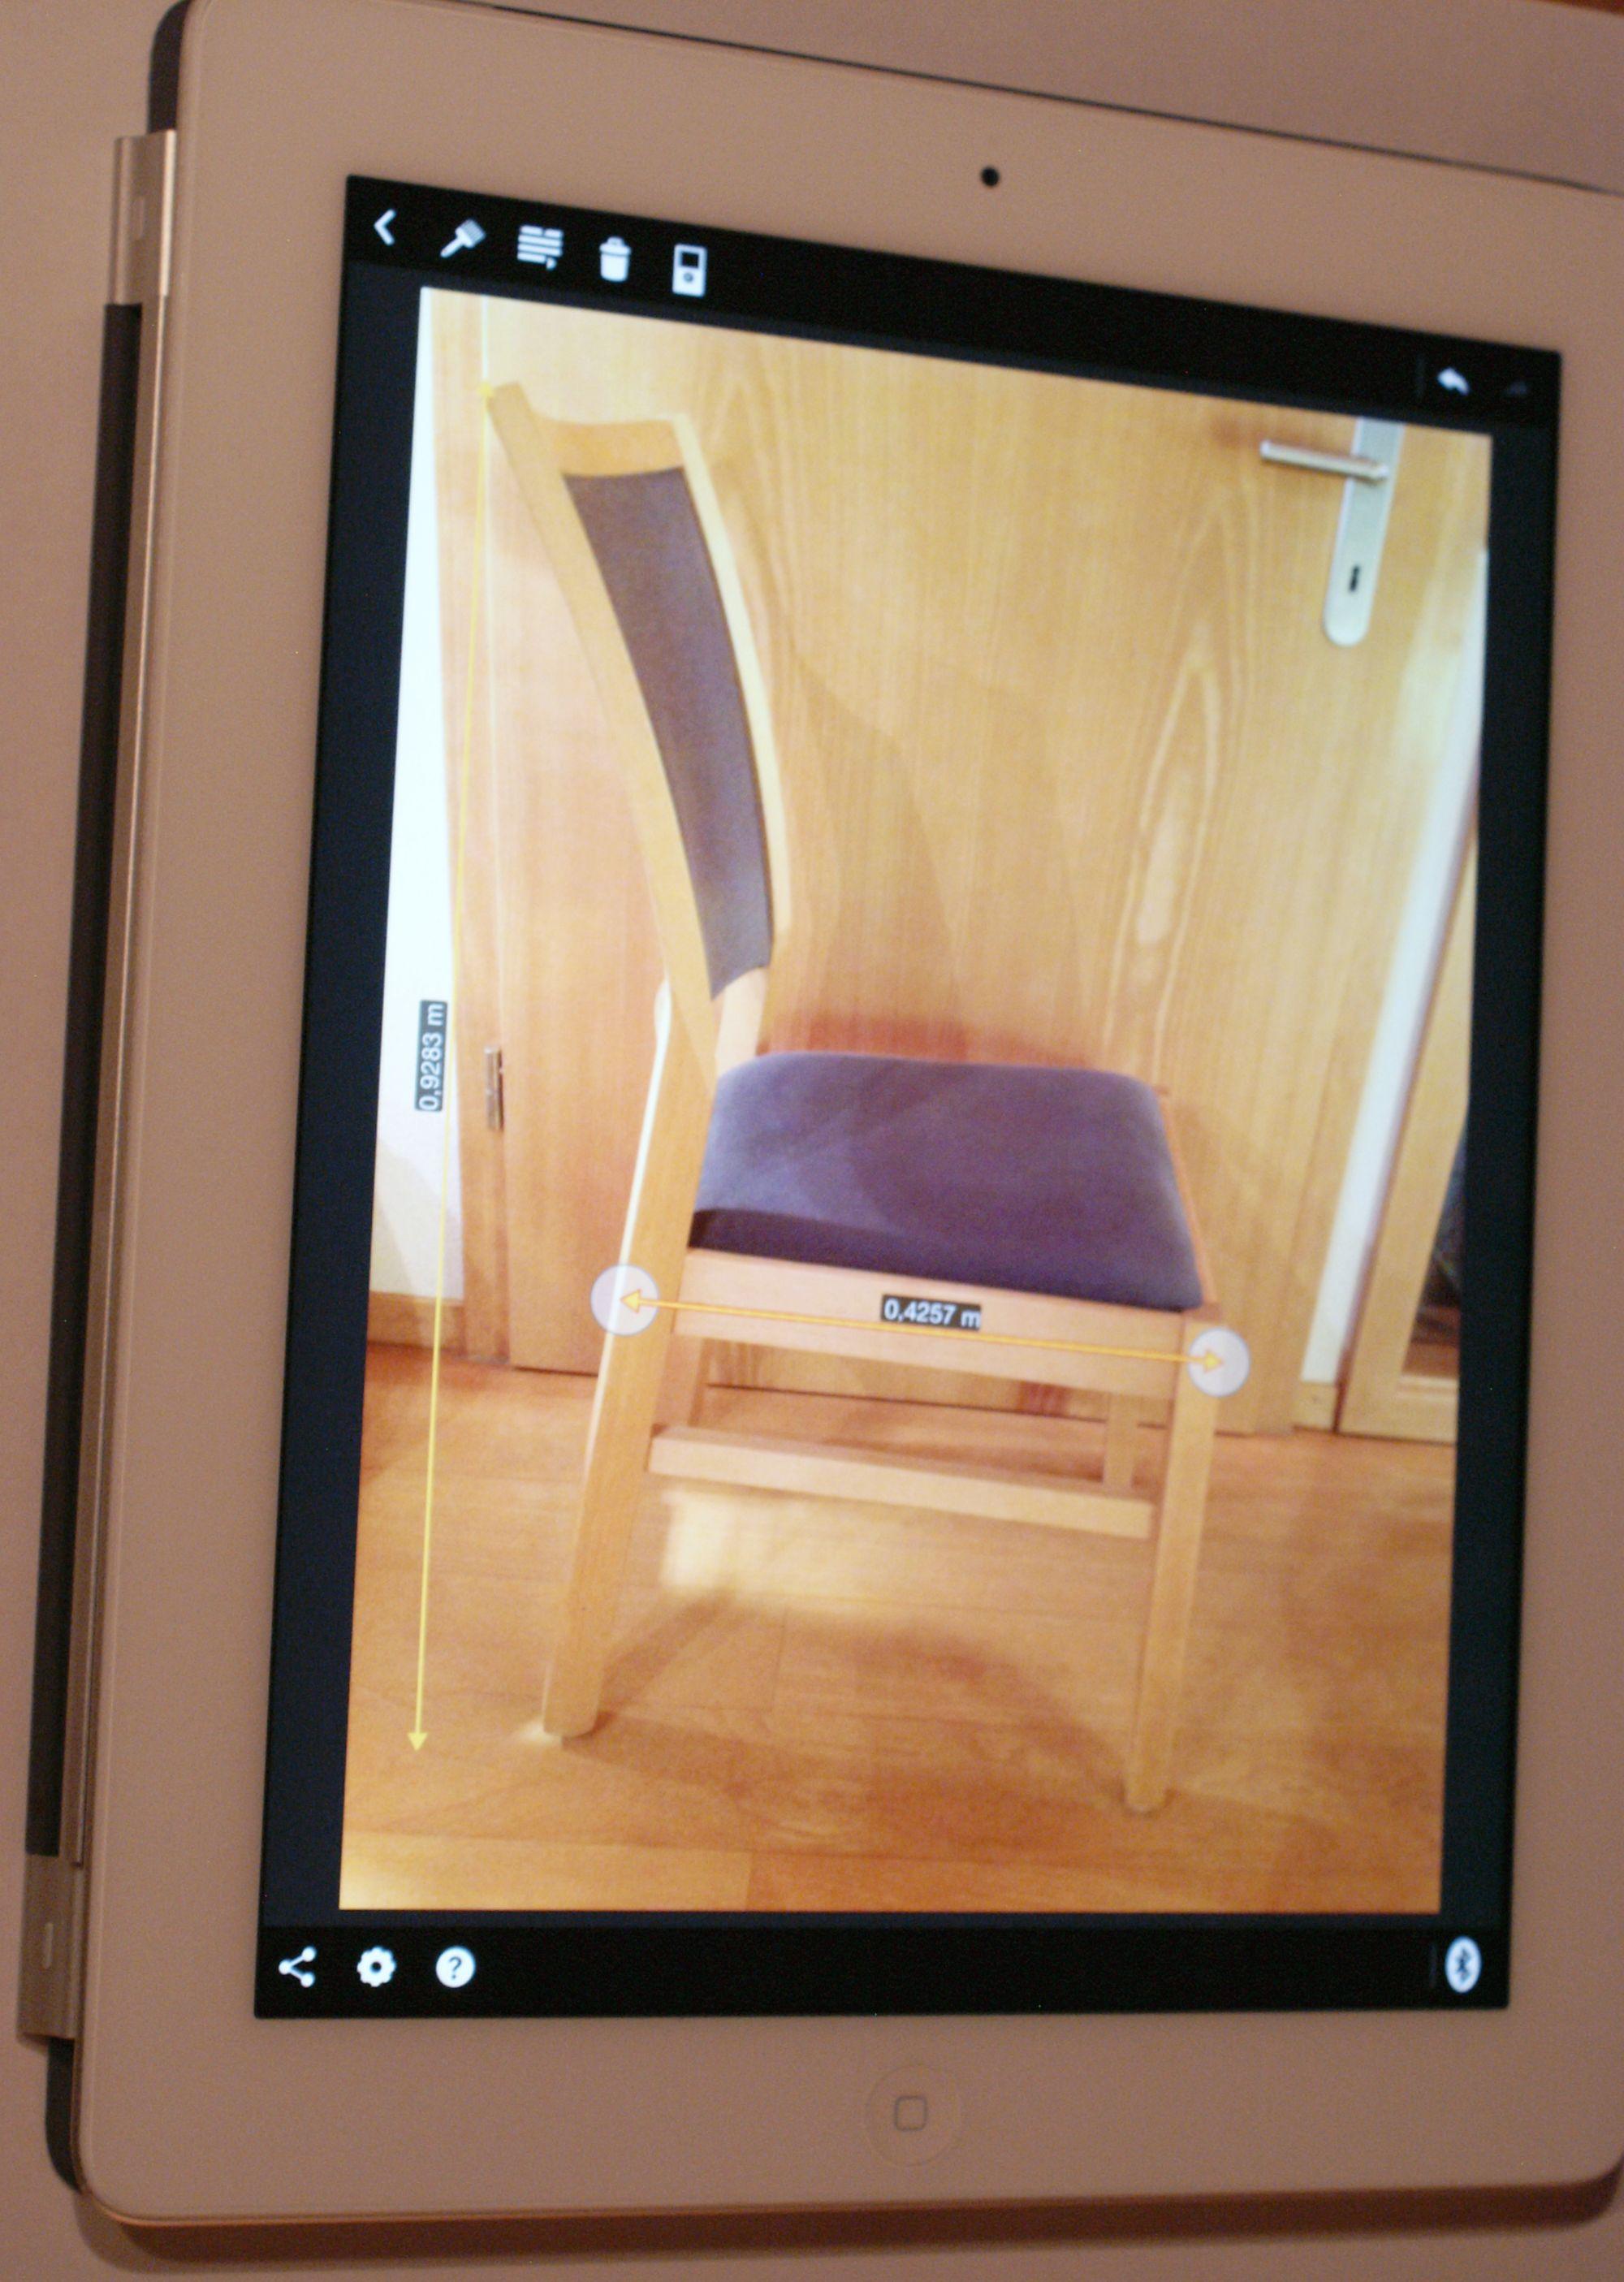 GLGLM 100 C App Ausmessen Stuhl